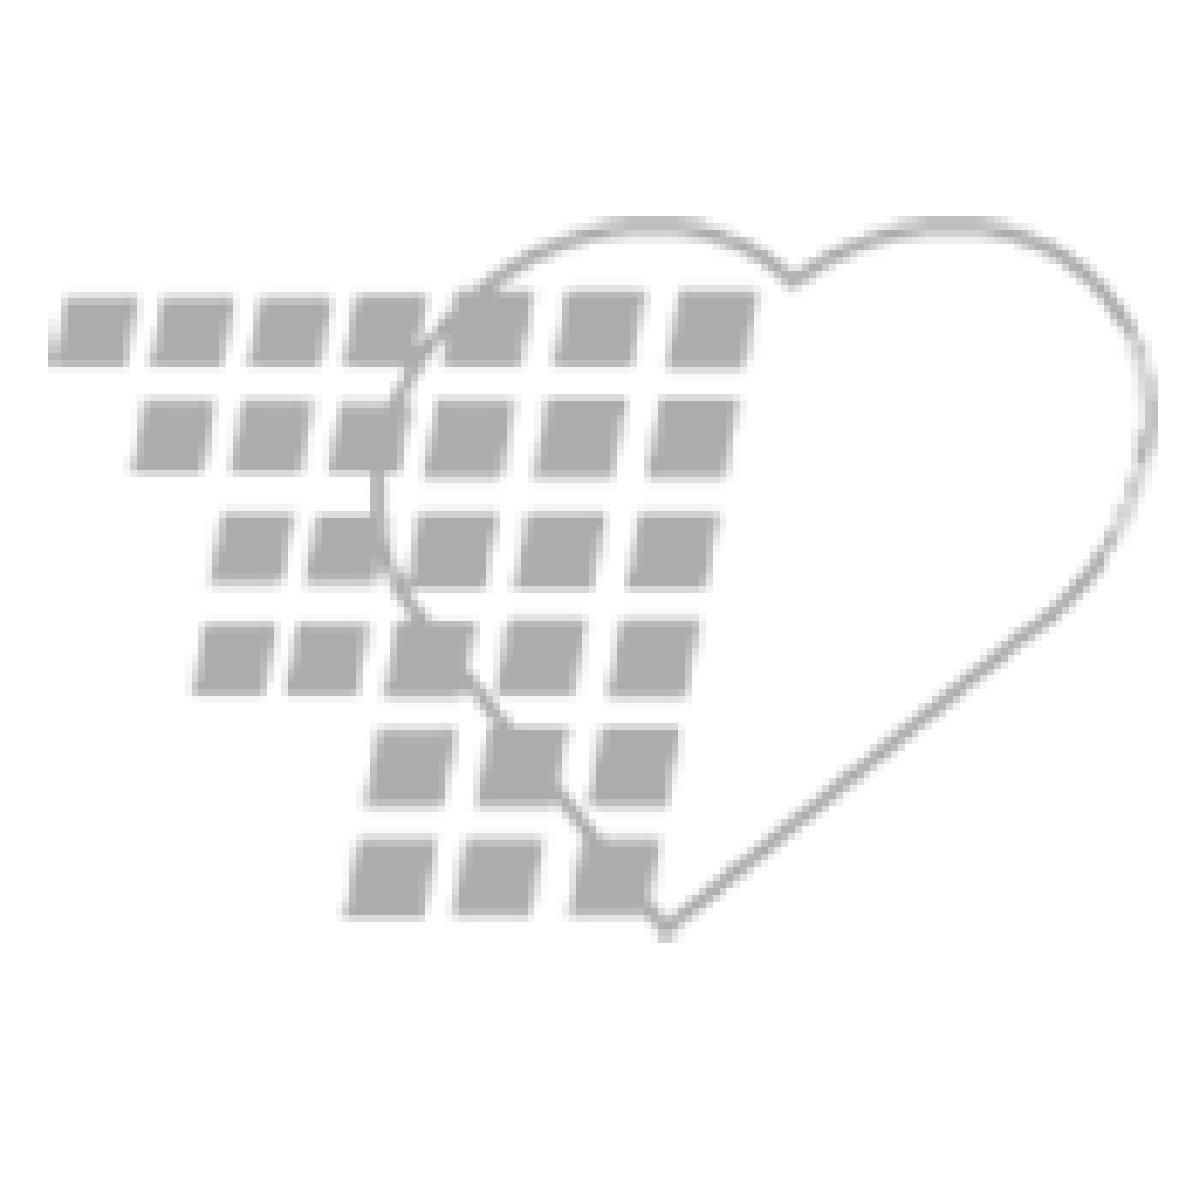 11-81-2610 Laerdal Blood Pressure Training Arm